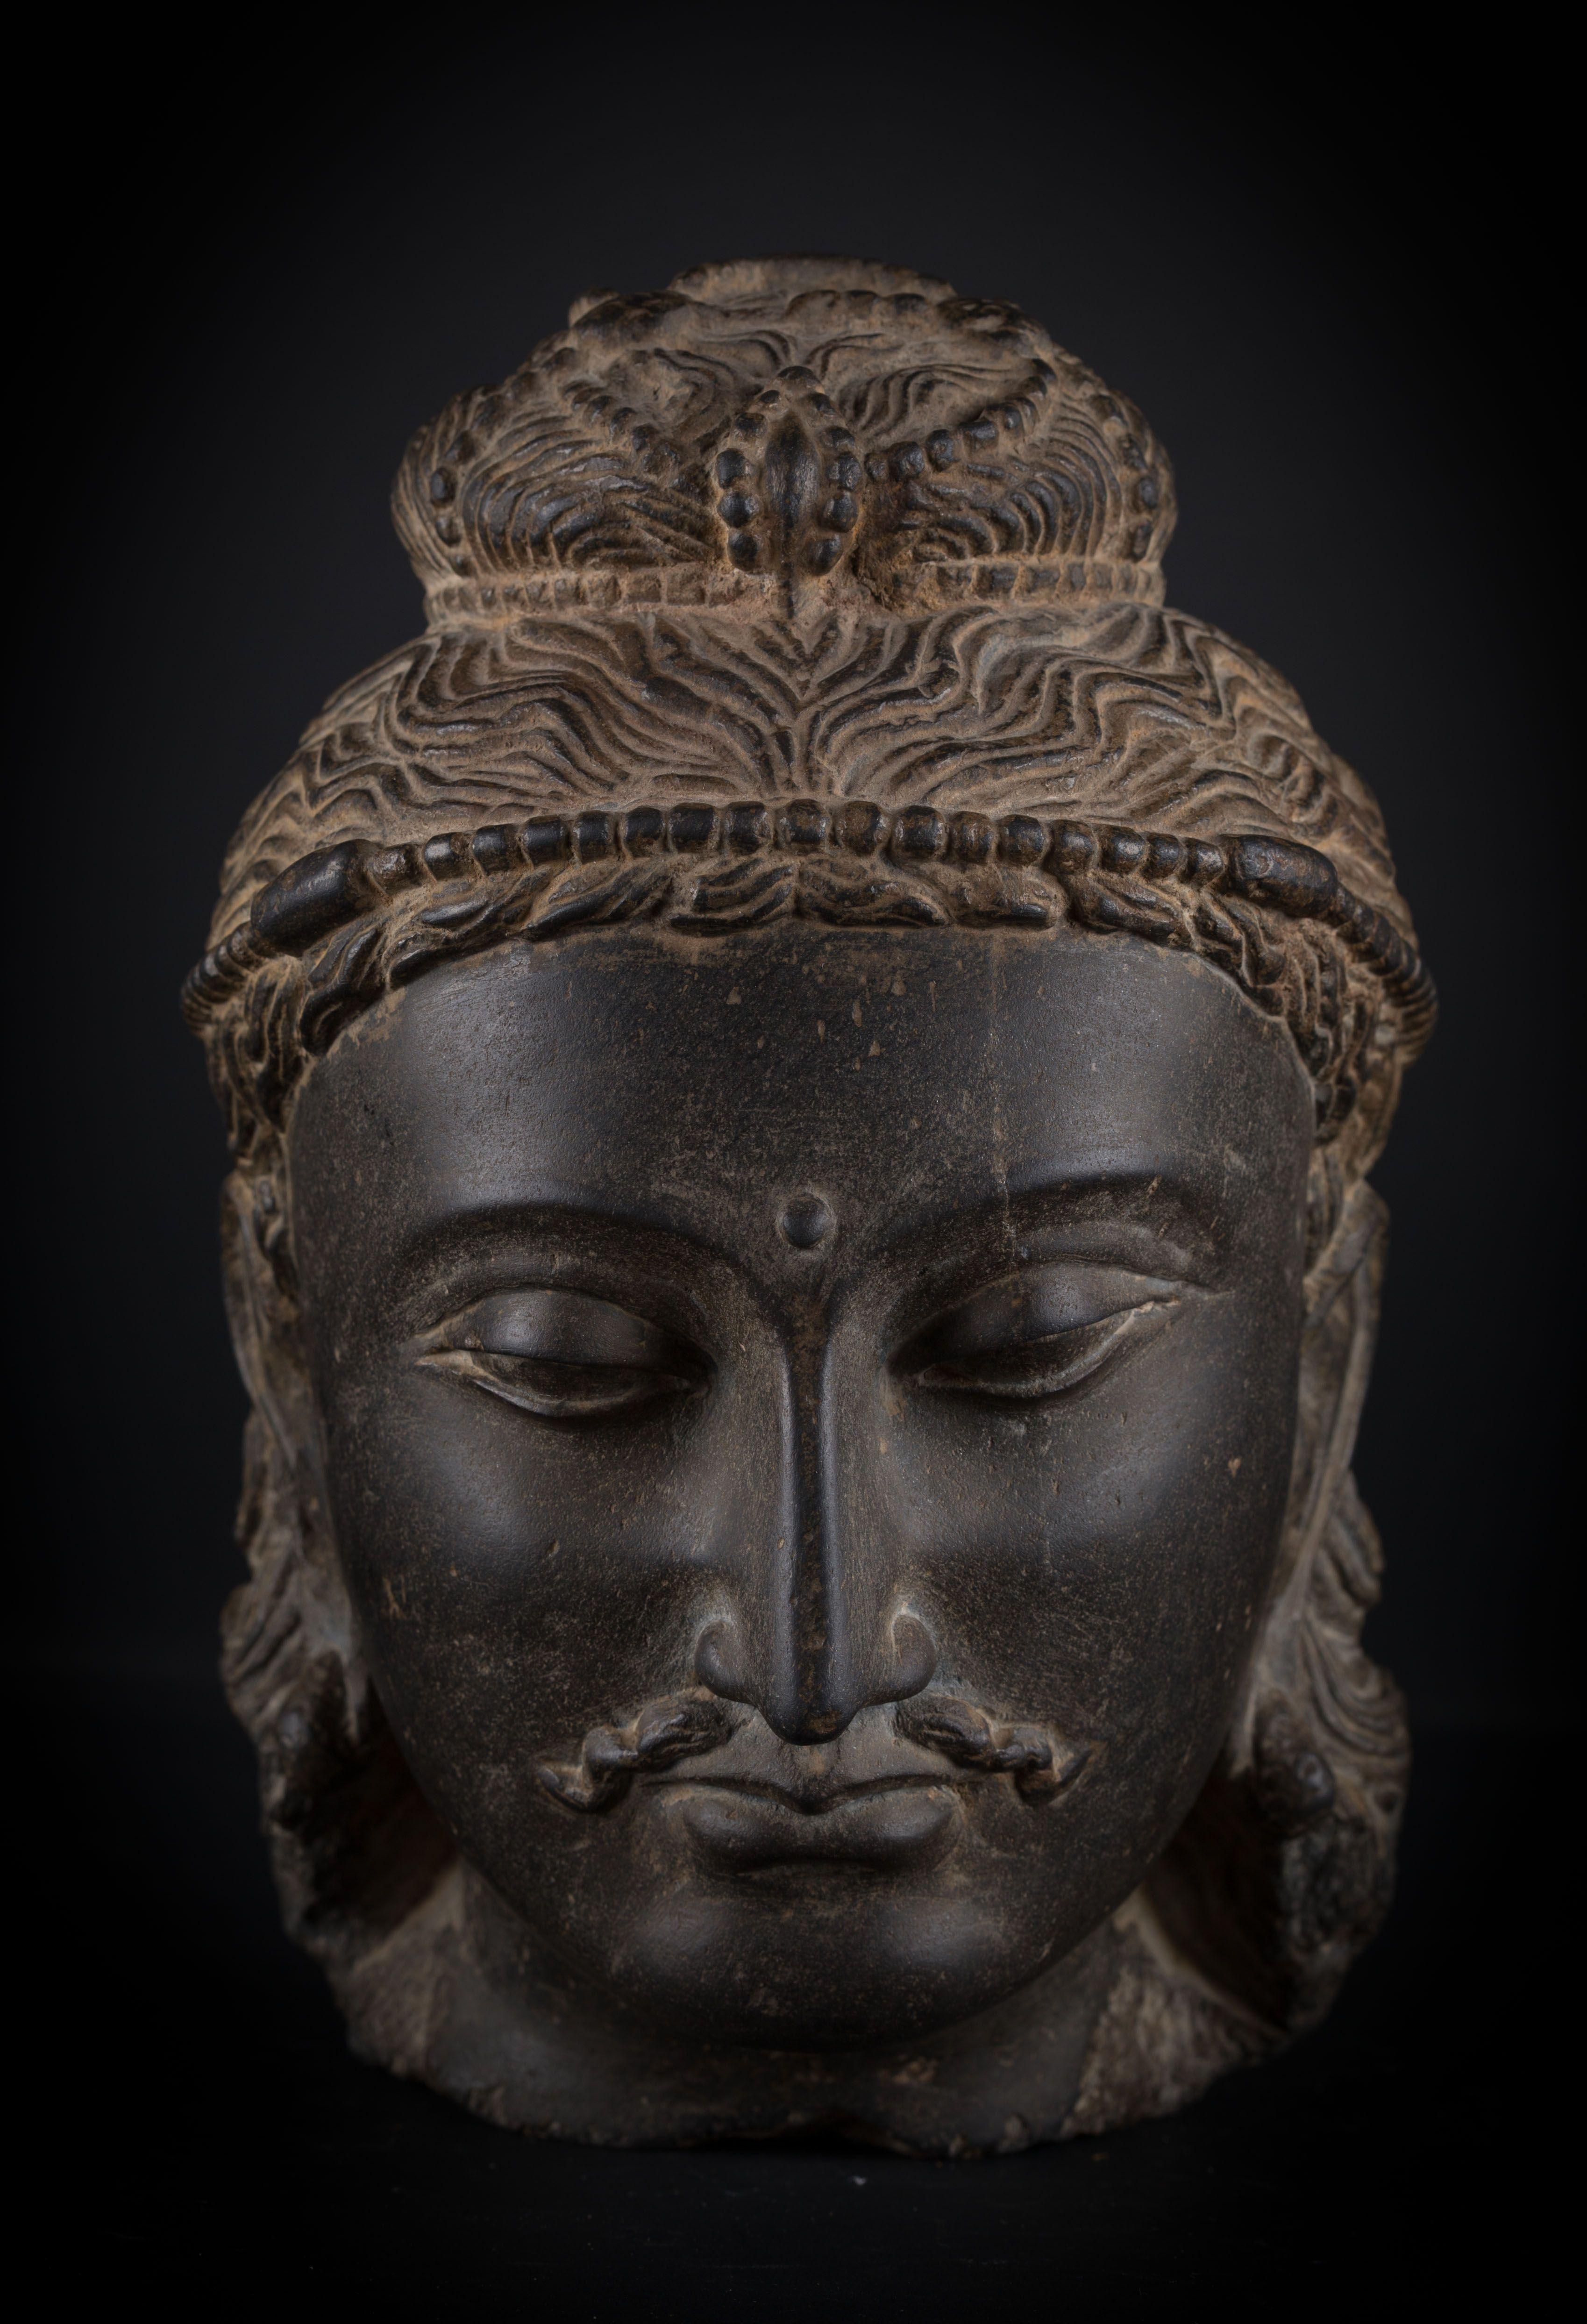 Head of Bodhisattva Gandhara art, northern Pakistan, 3rd-4th century